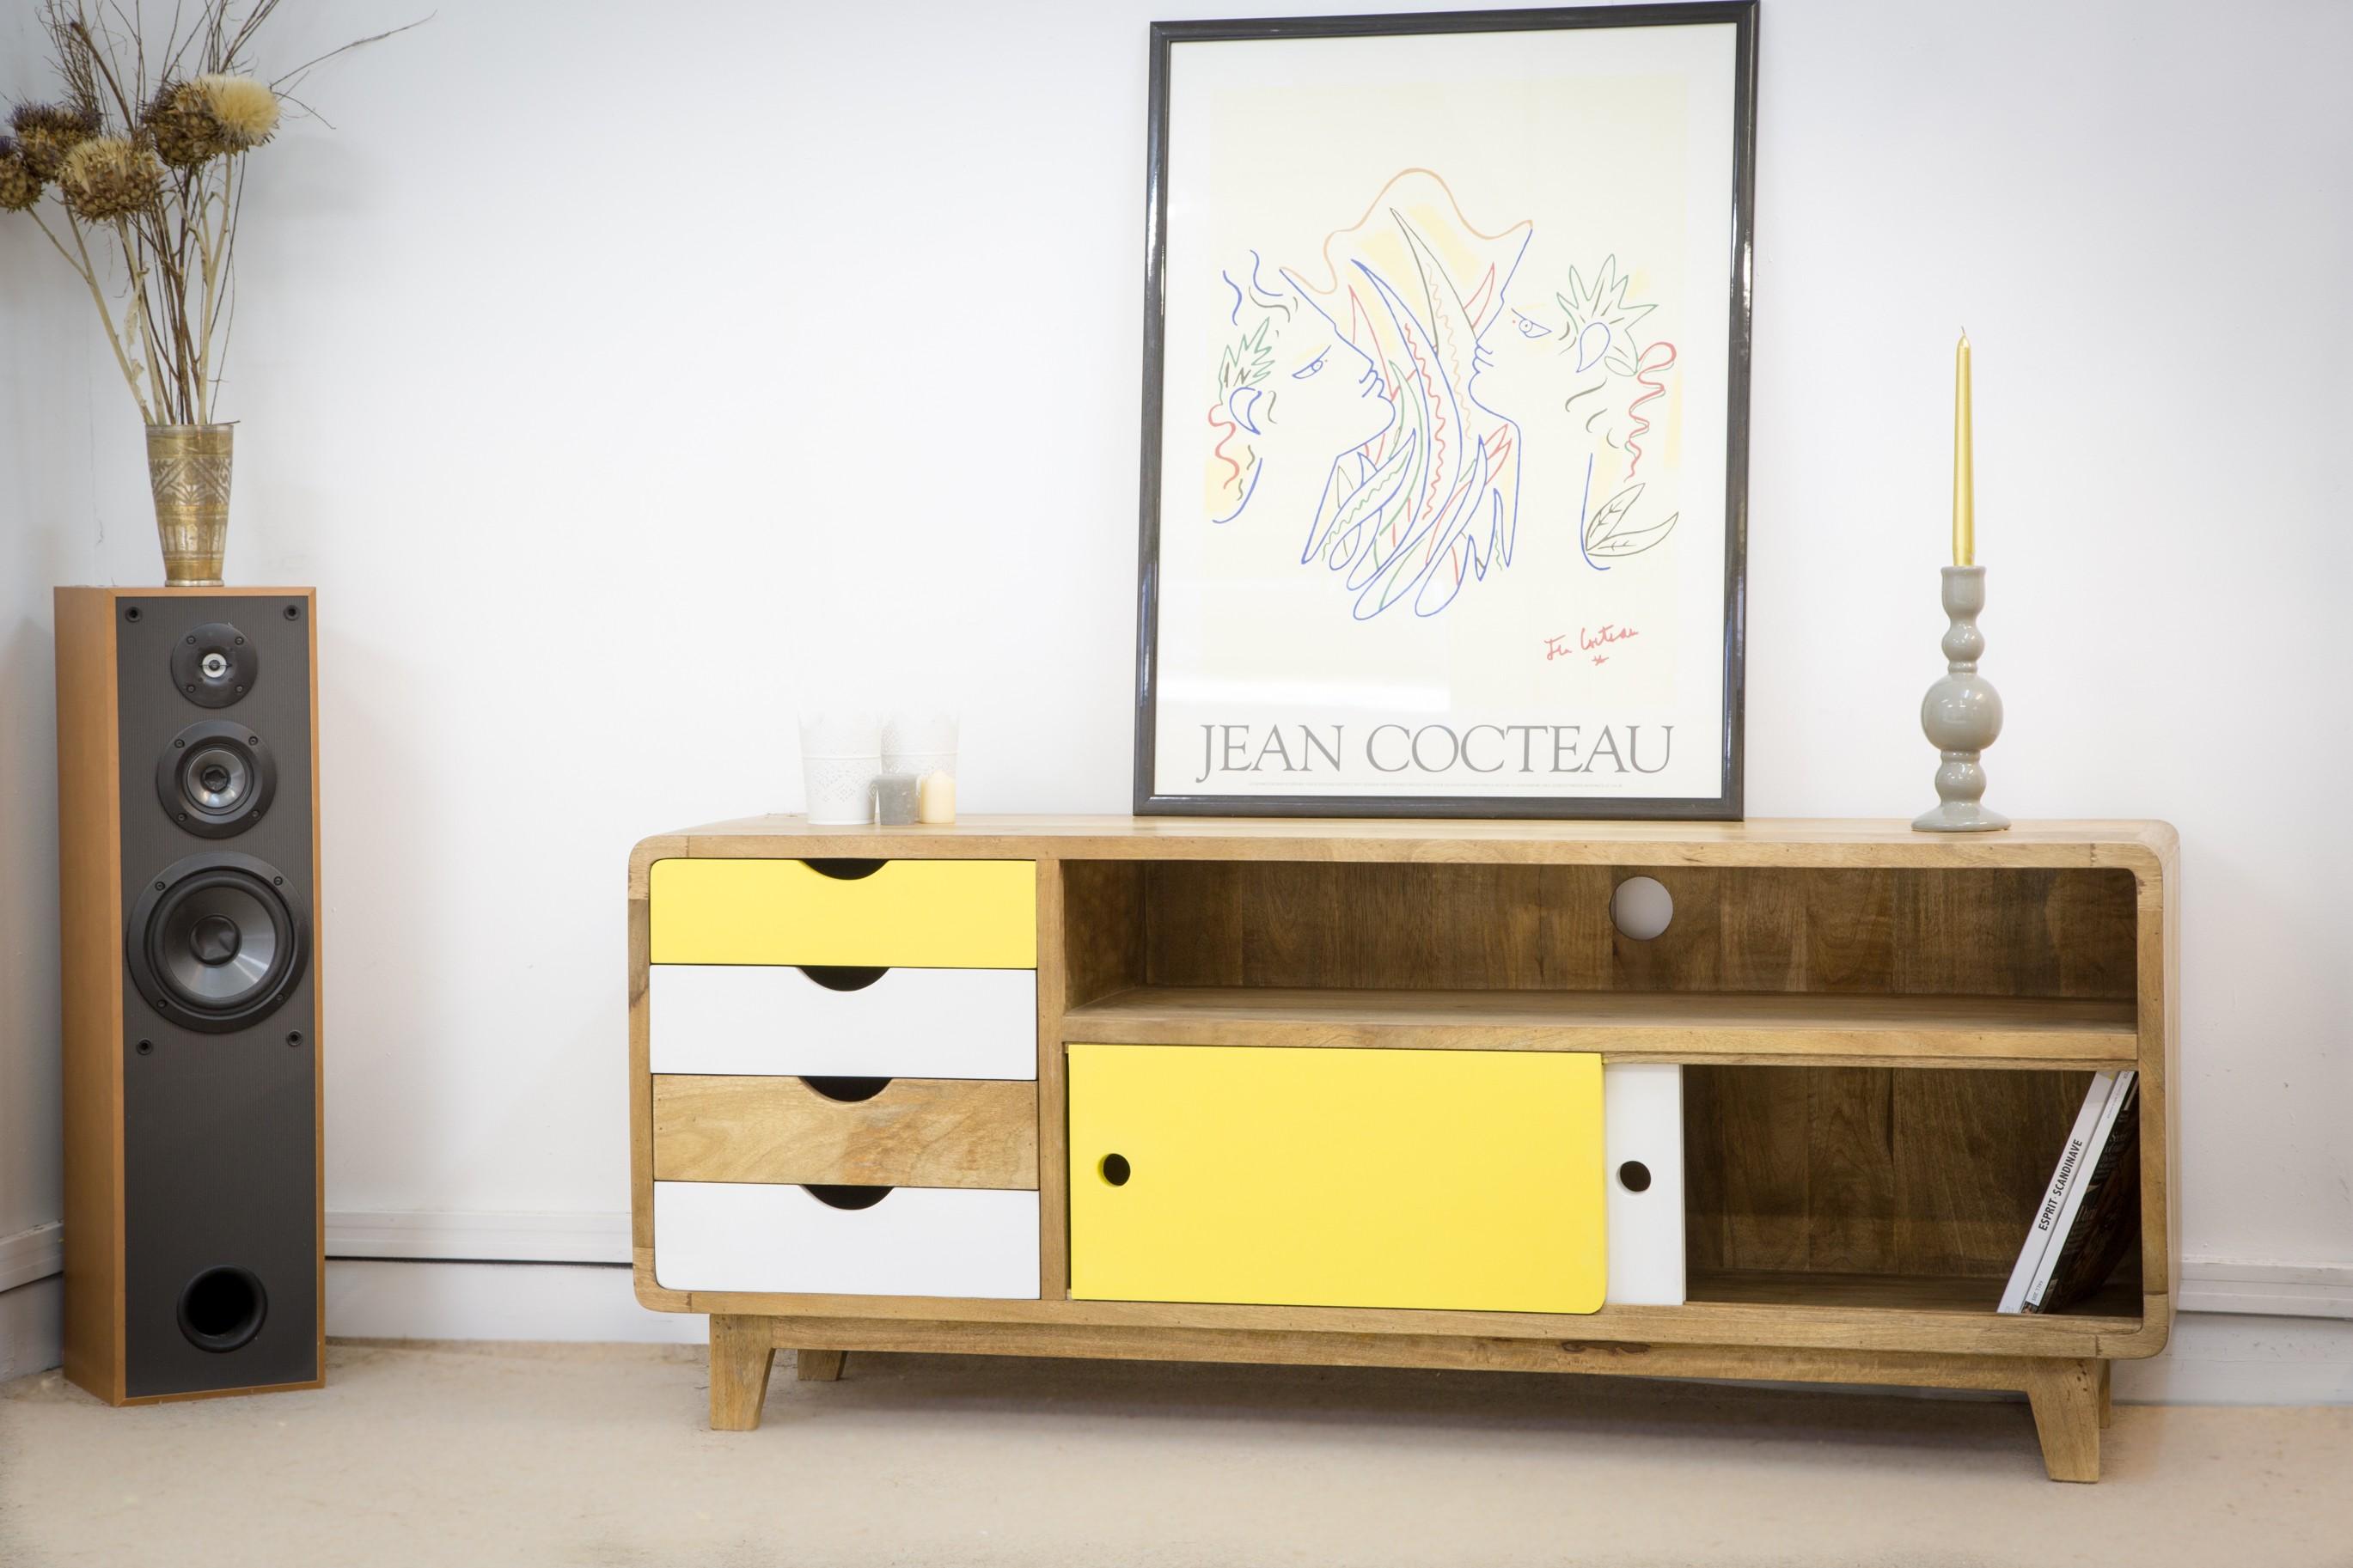 mobilier style scandinave pas cher infini photo. Black Bedroom Furniture Sets. Home Design Ideas